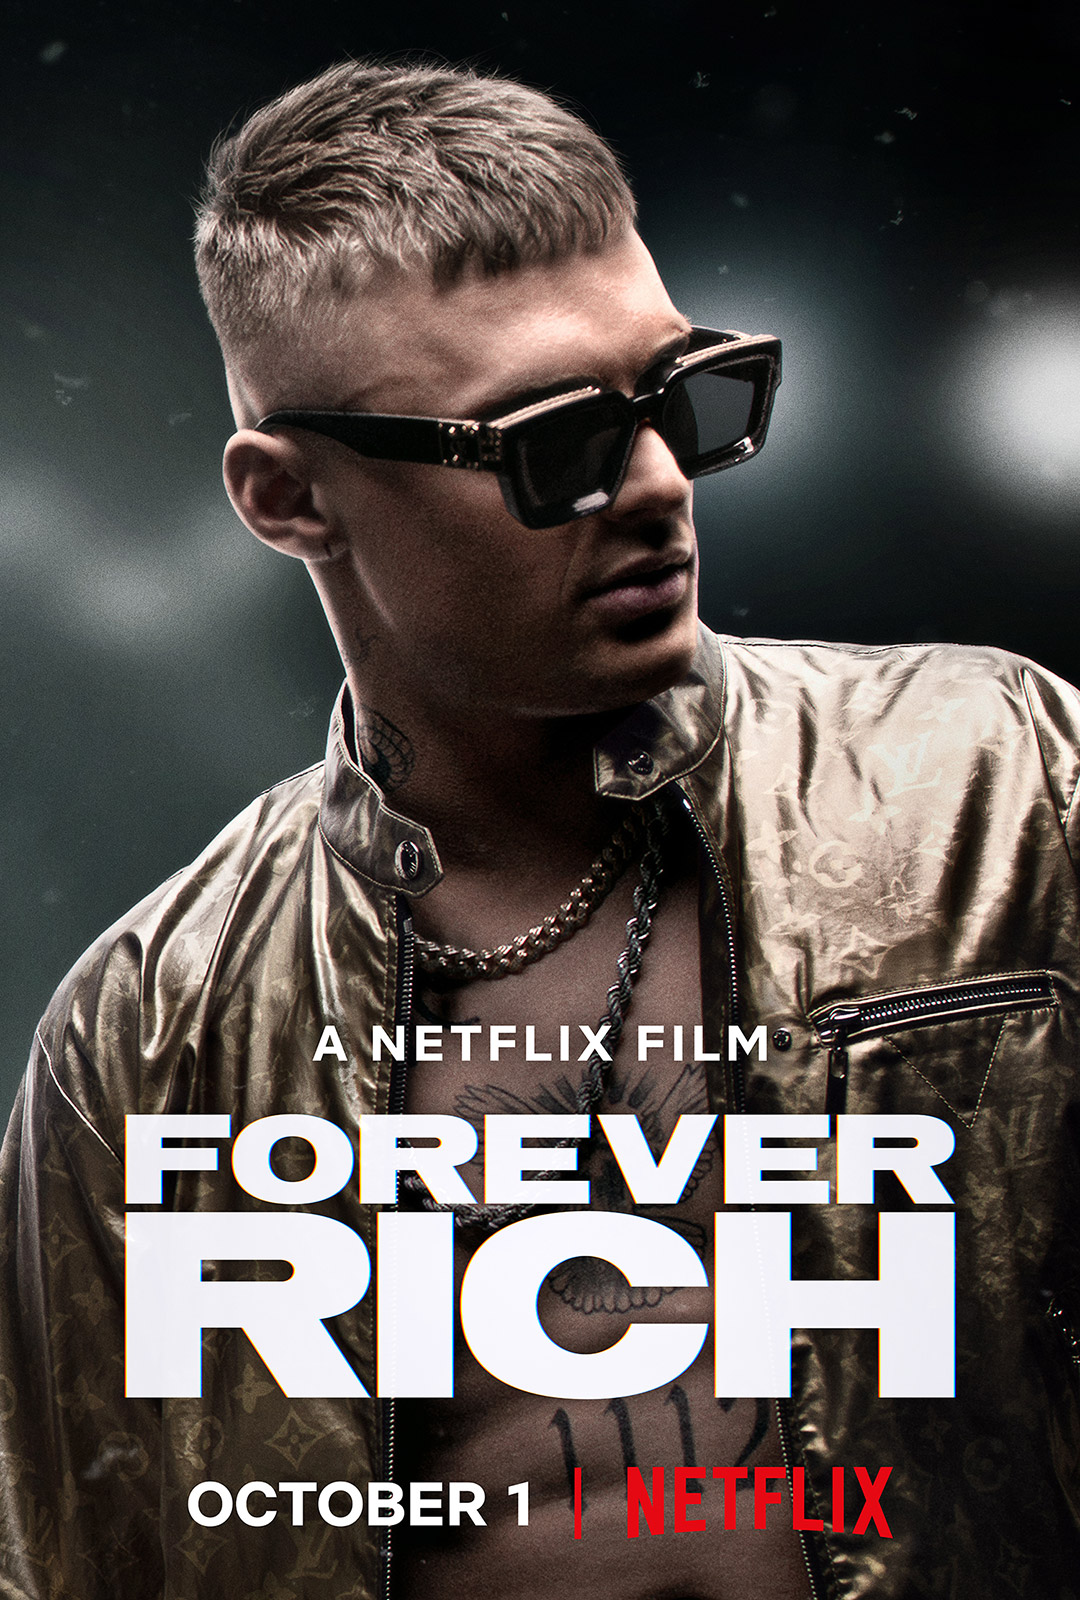 [好雷] 永遠的富里奇 Forever Rich (Netflix 荷蘭片)